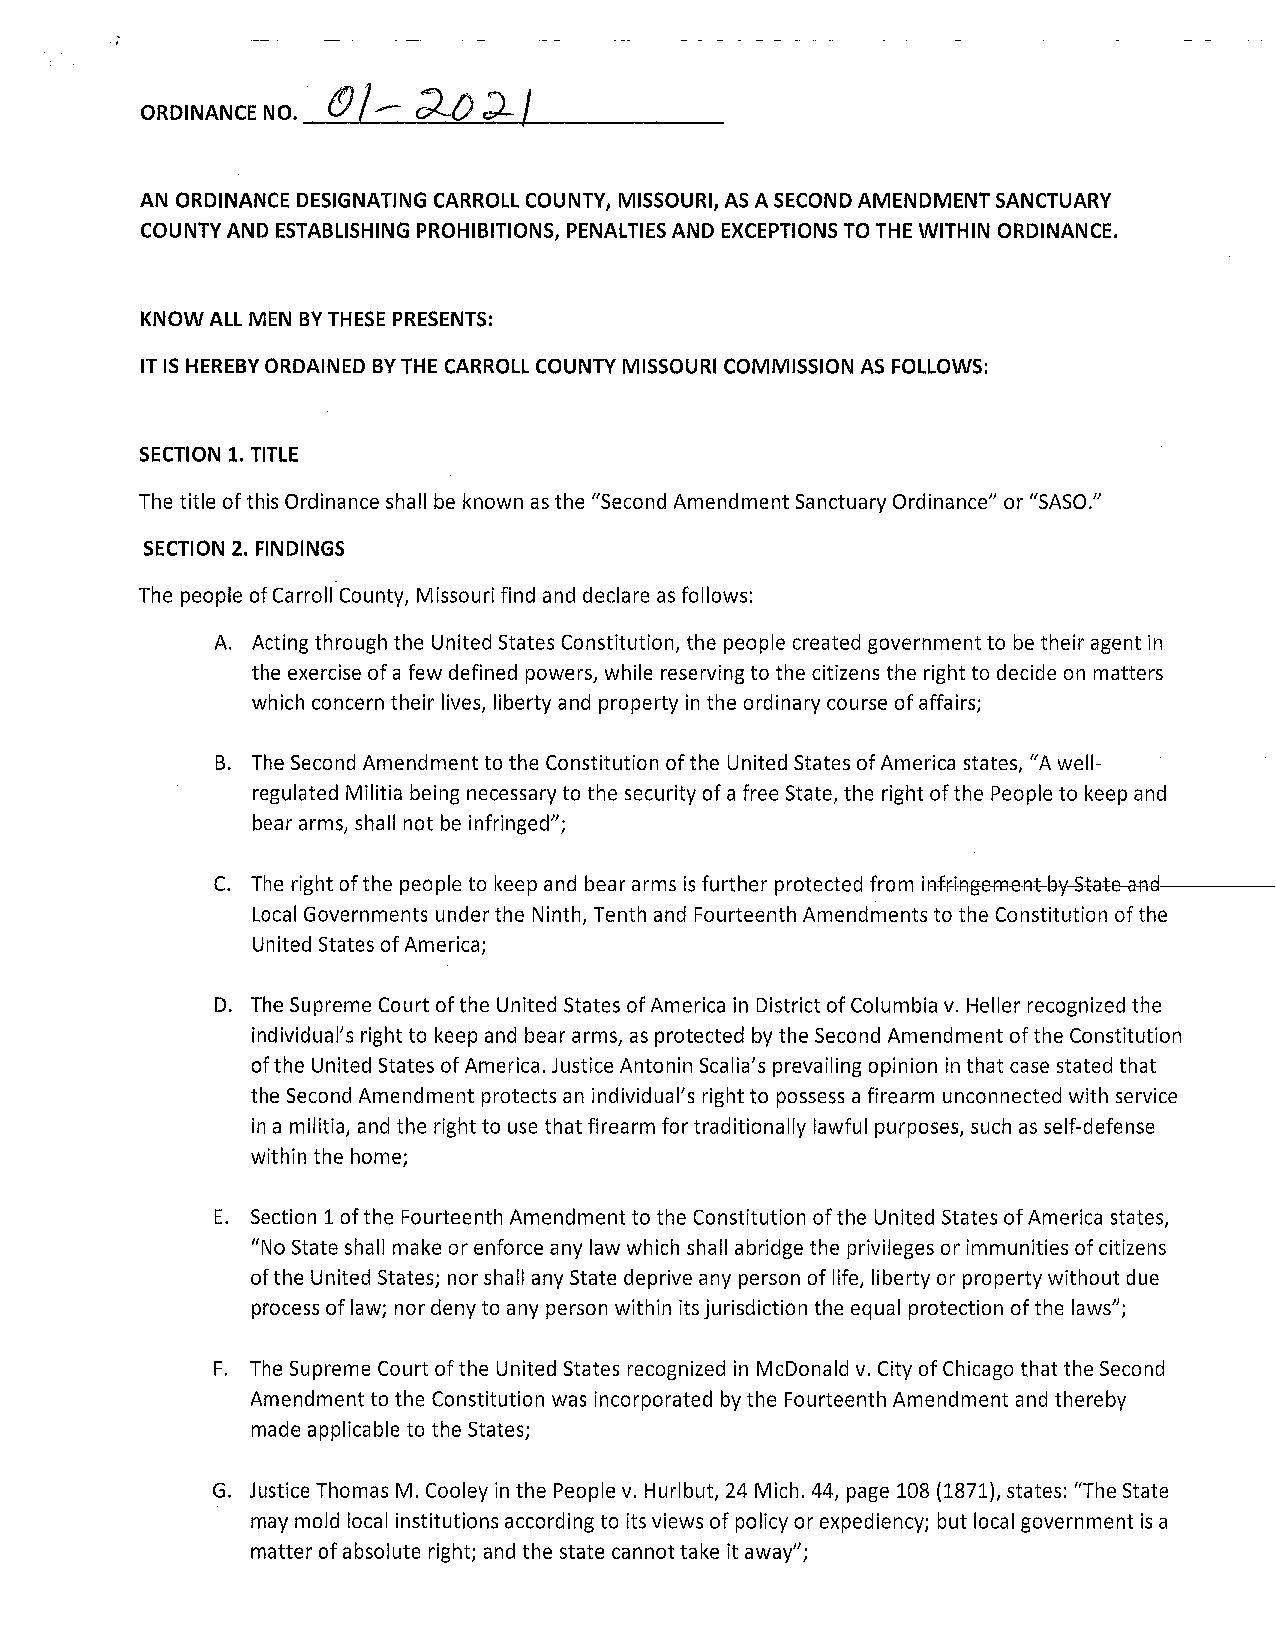 Carroll County Missouri Second Amendment Sanctuary Ordinance Page 1